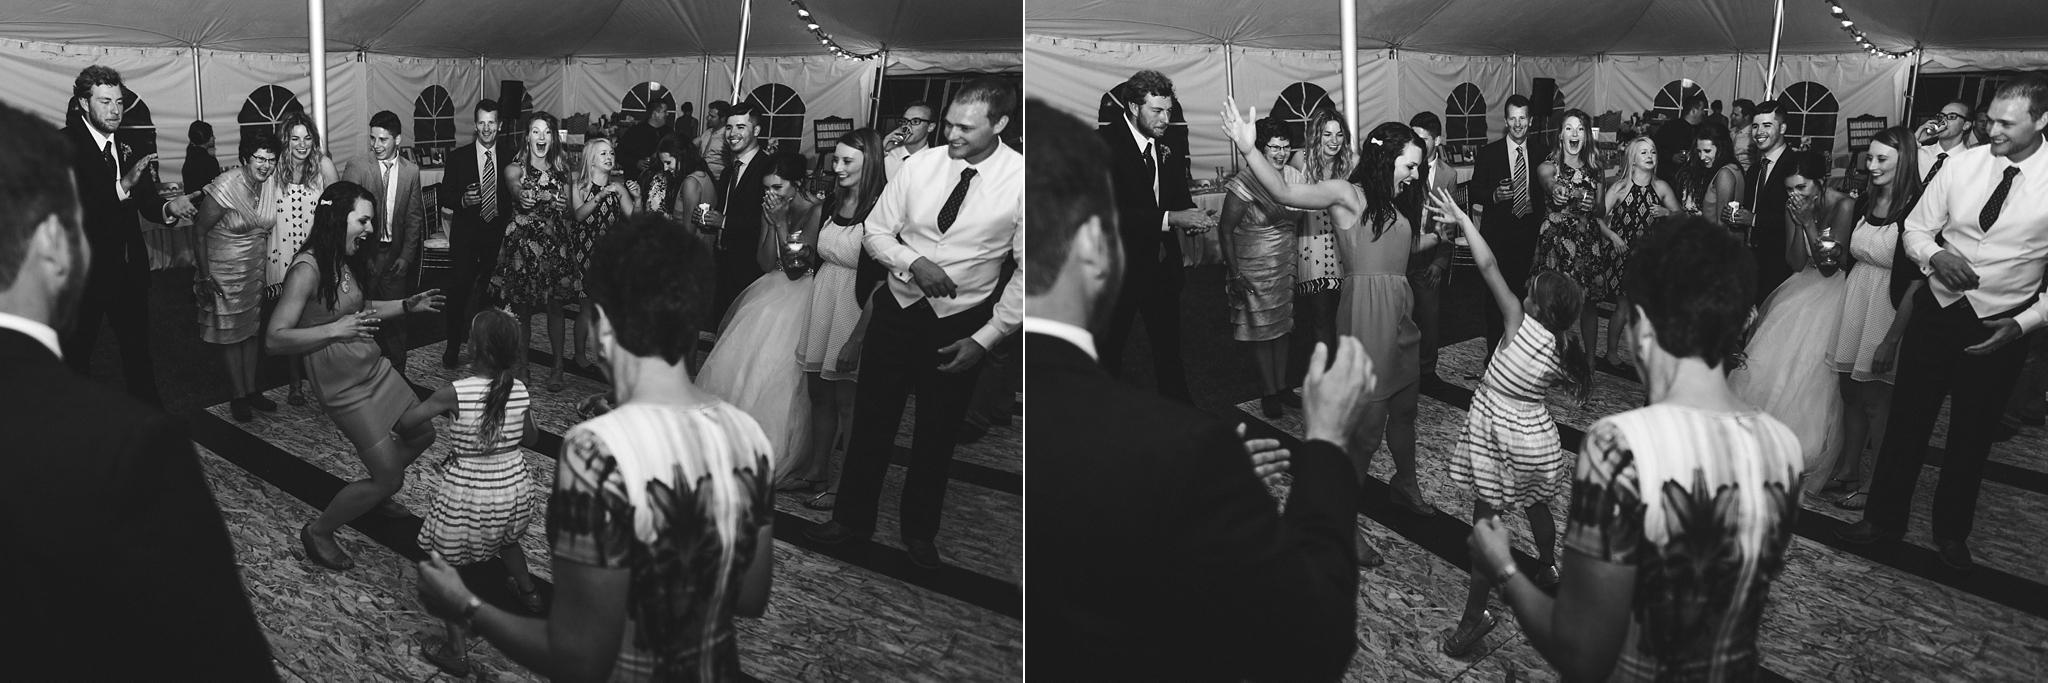 kaihla_tonai_intimate_wedding_elopement_photographer_0082